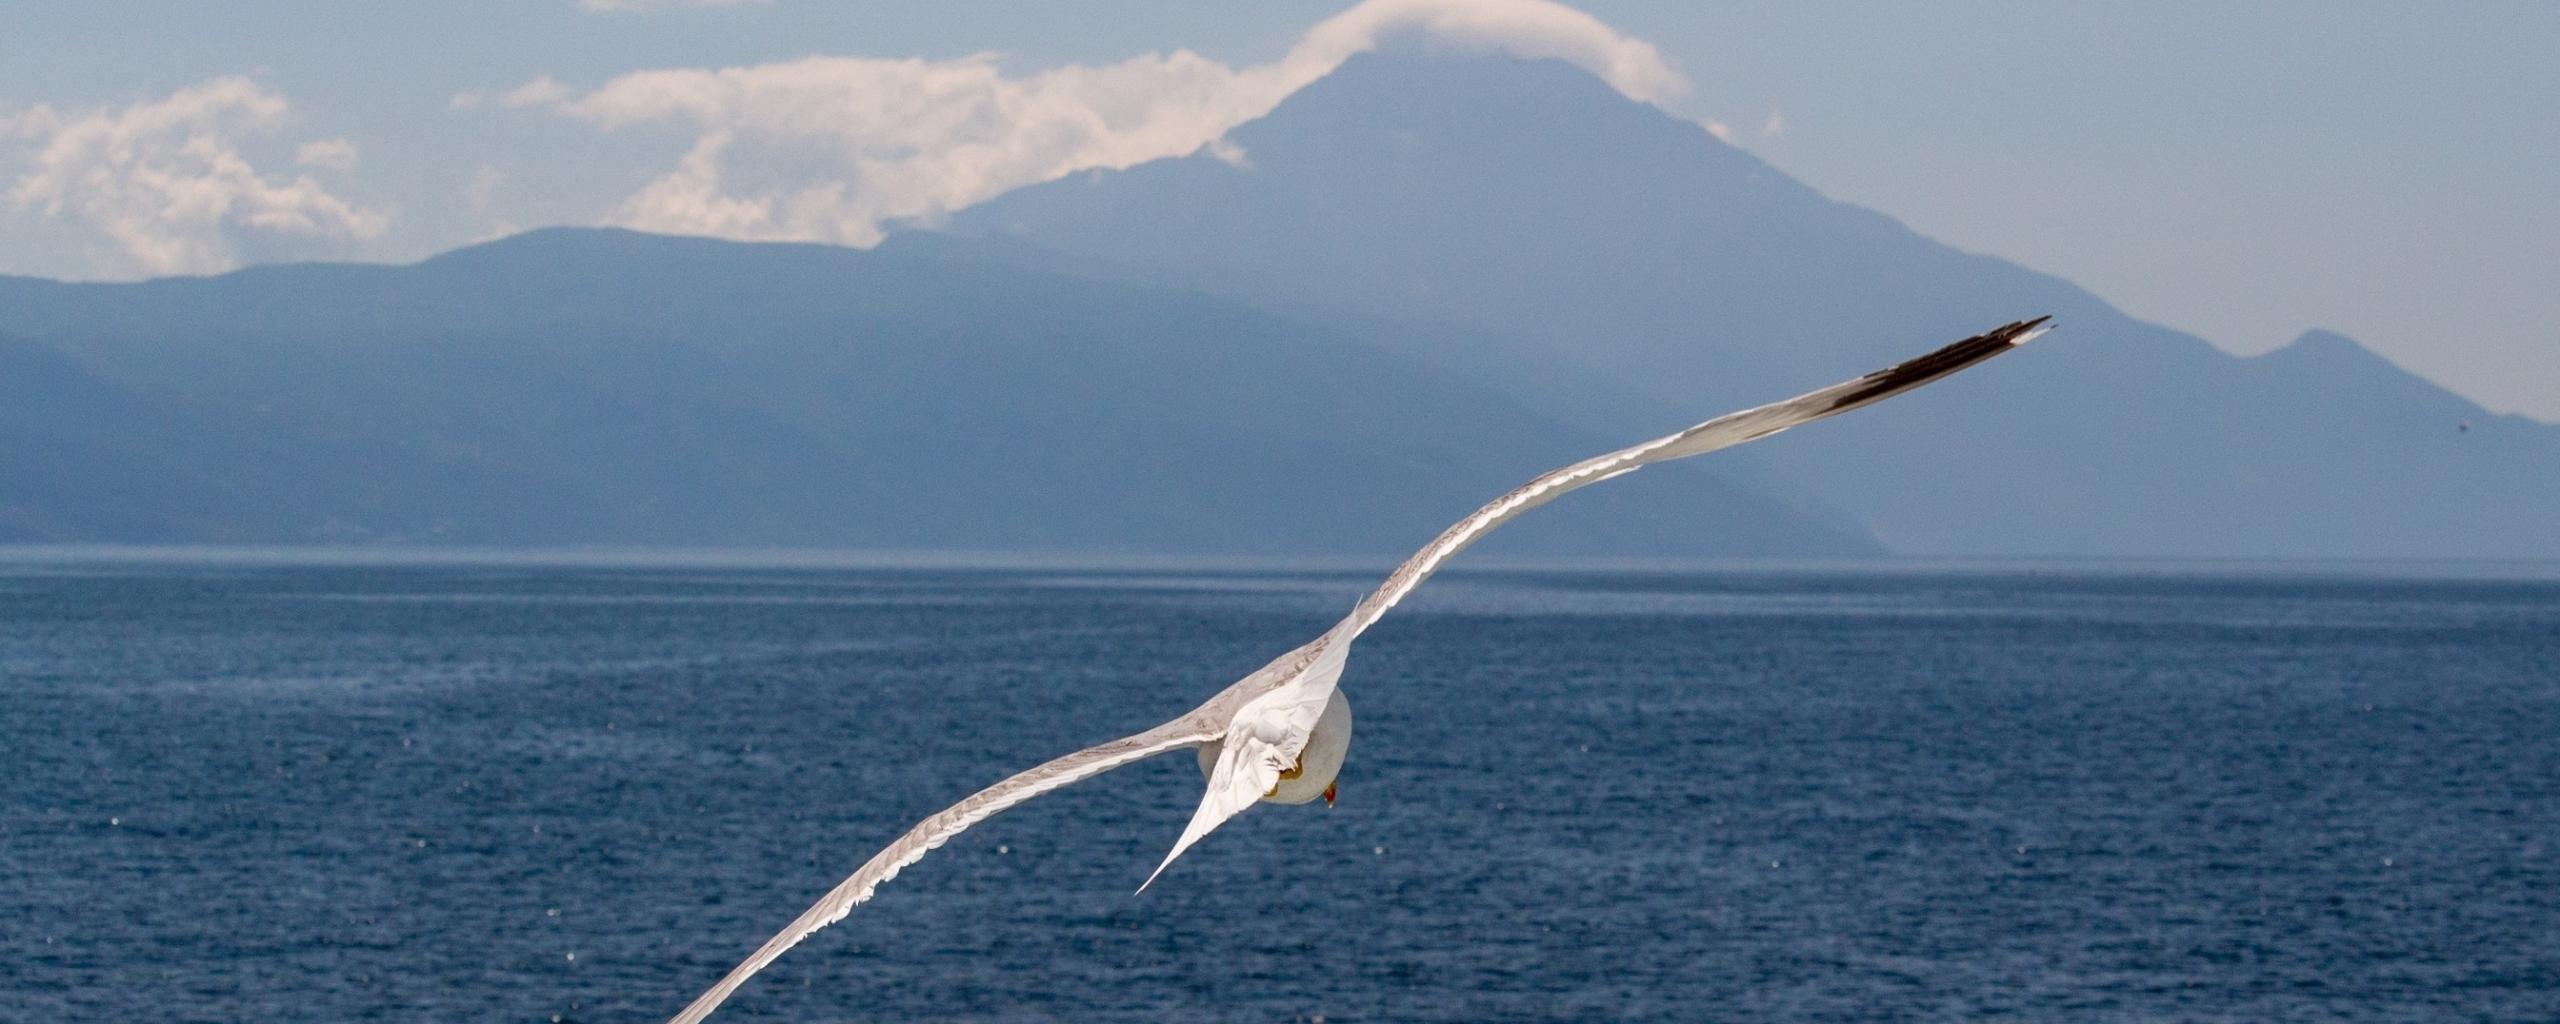 White bird, flight, sea, seagull, 2560x1024 wallpaper